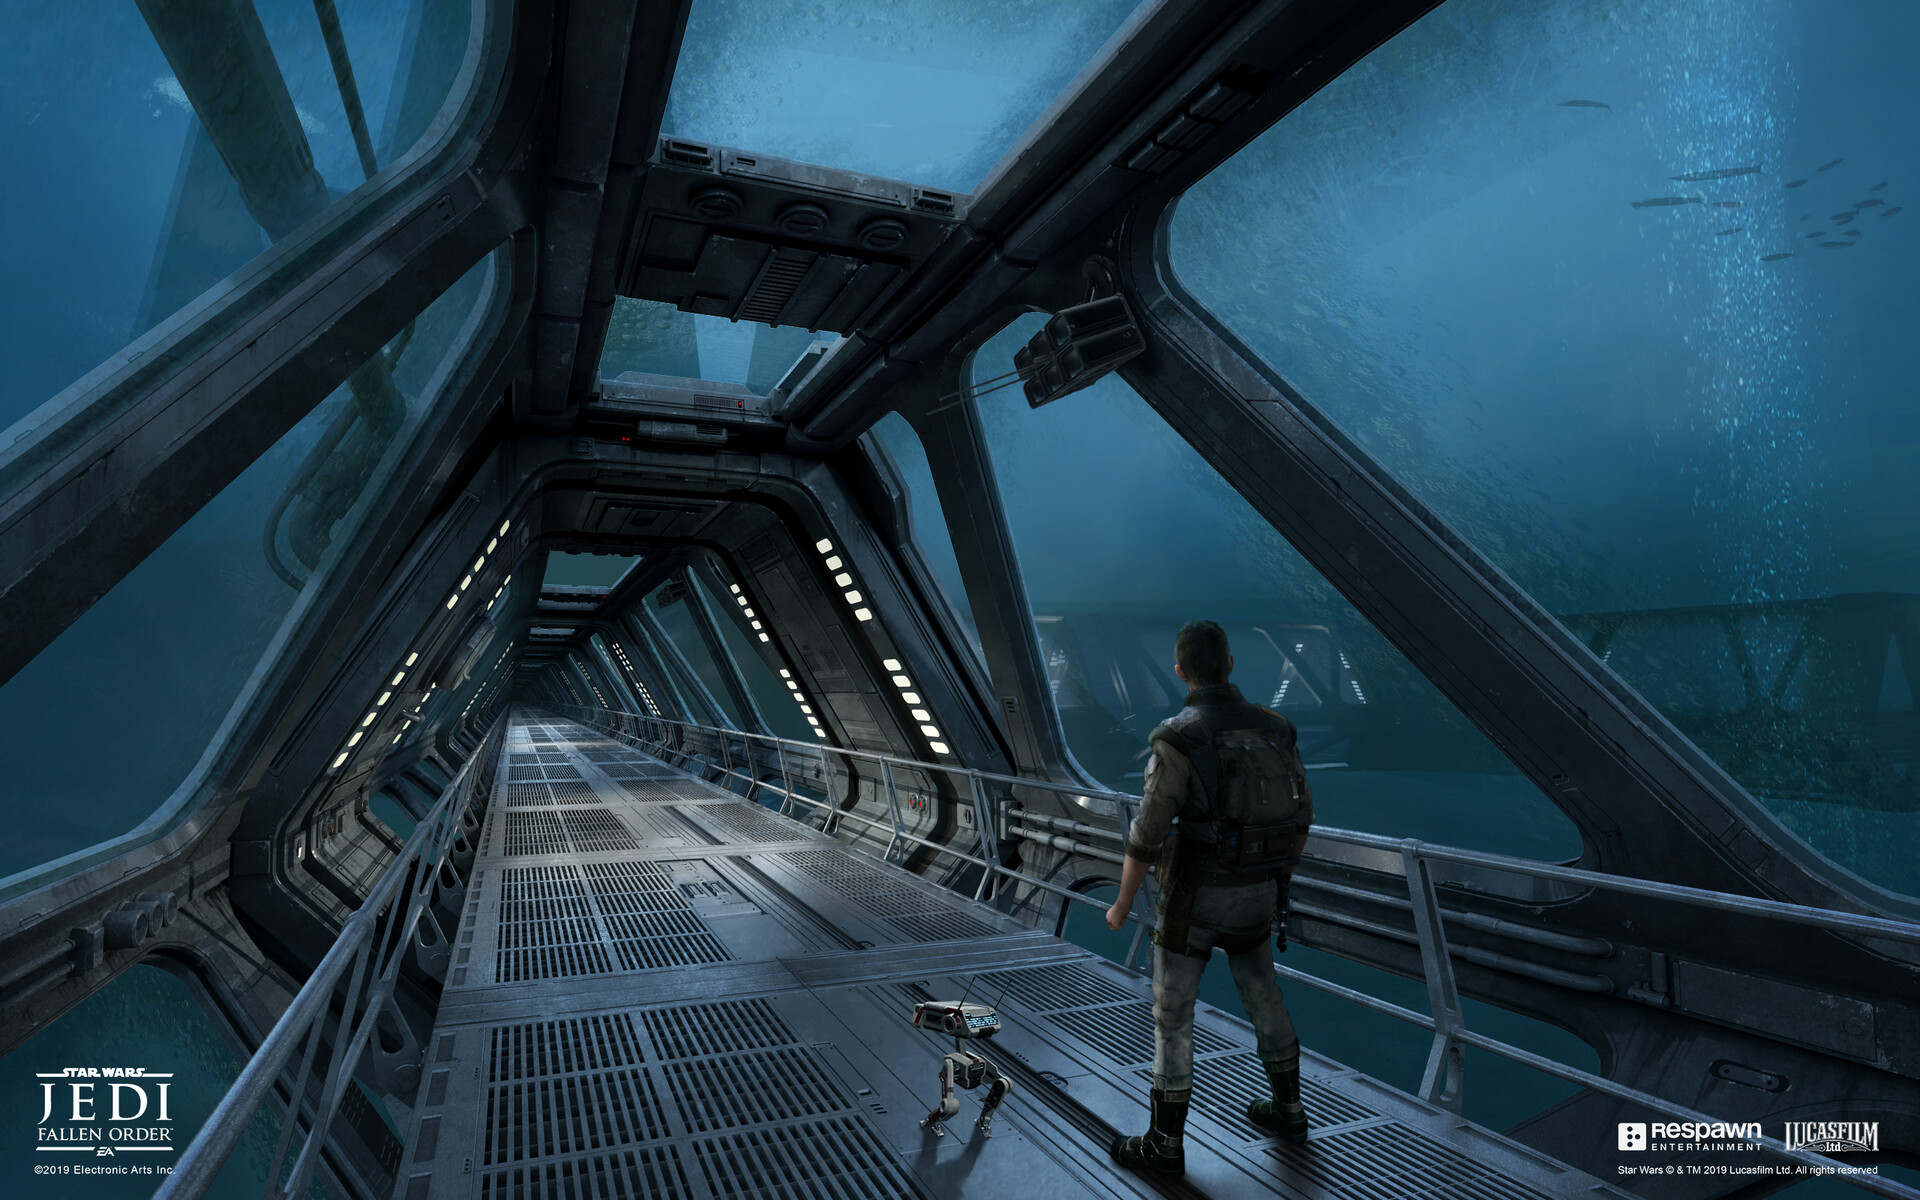 jean-francois-rey-fortress-tunnel-01.jpg